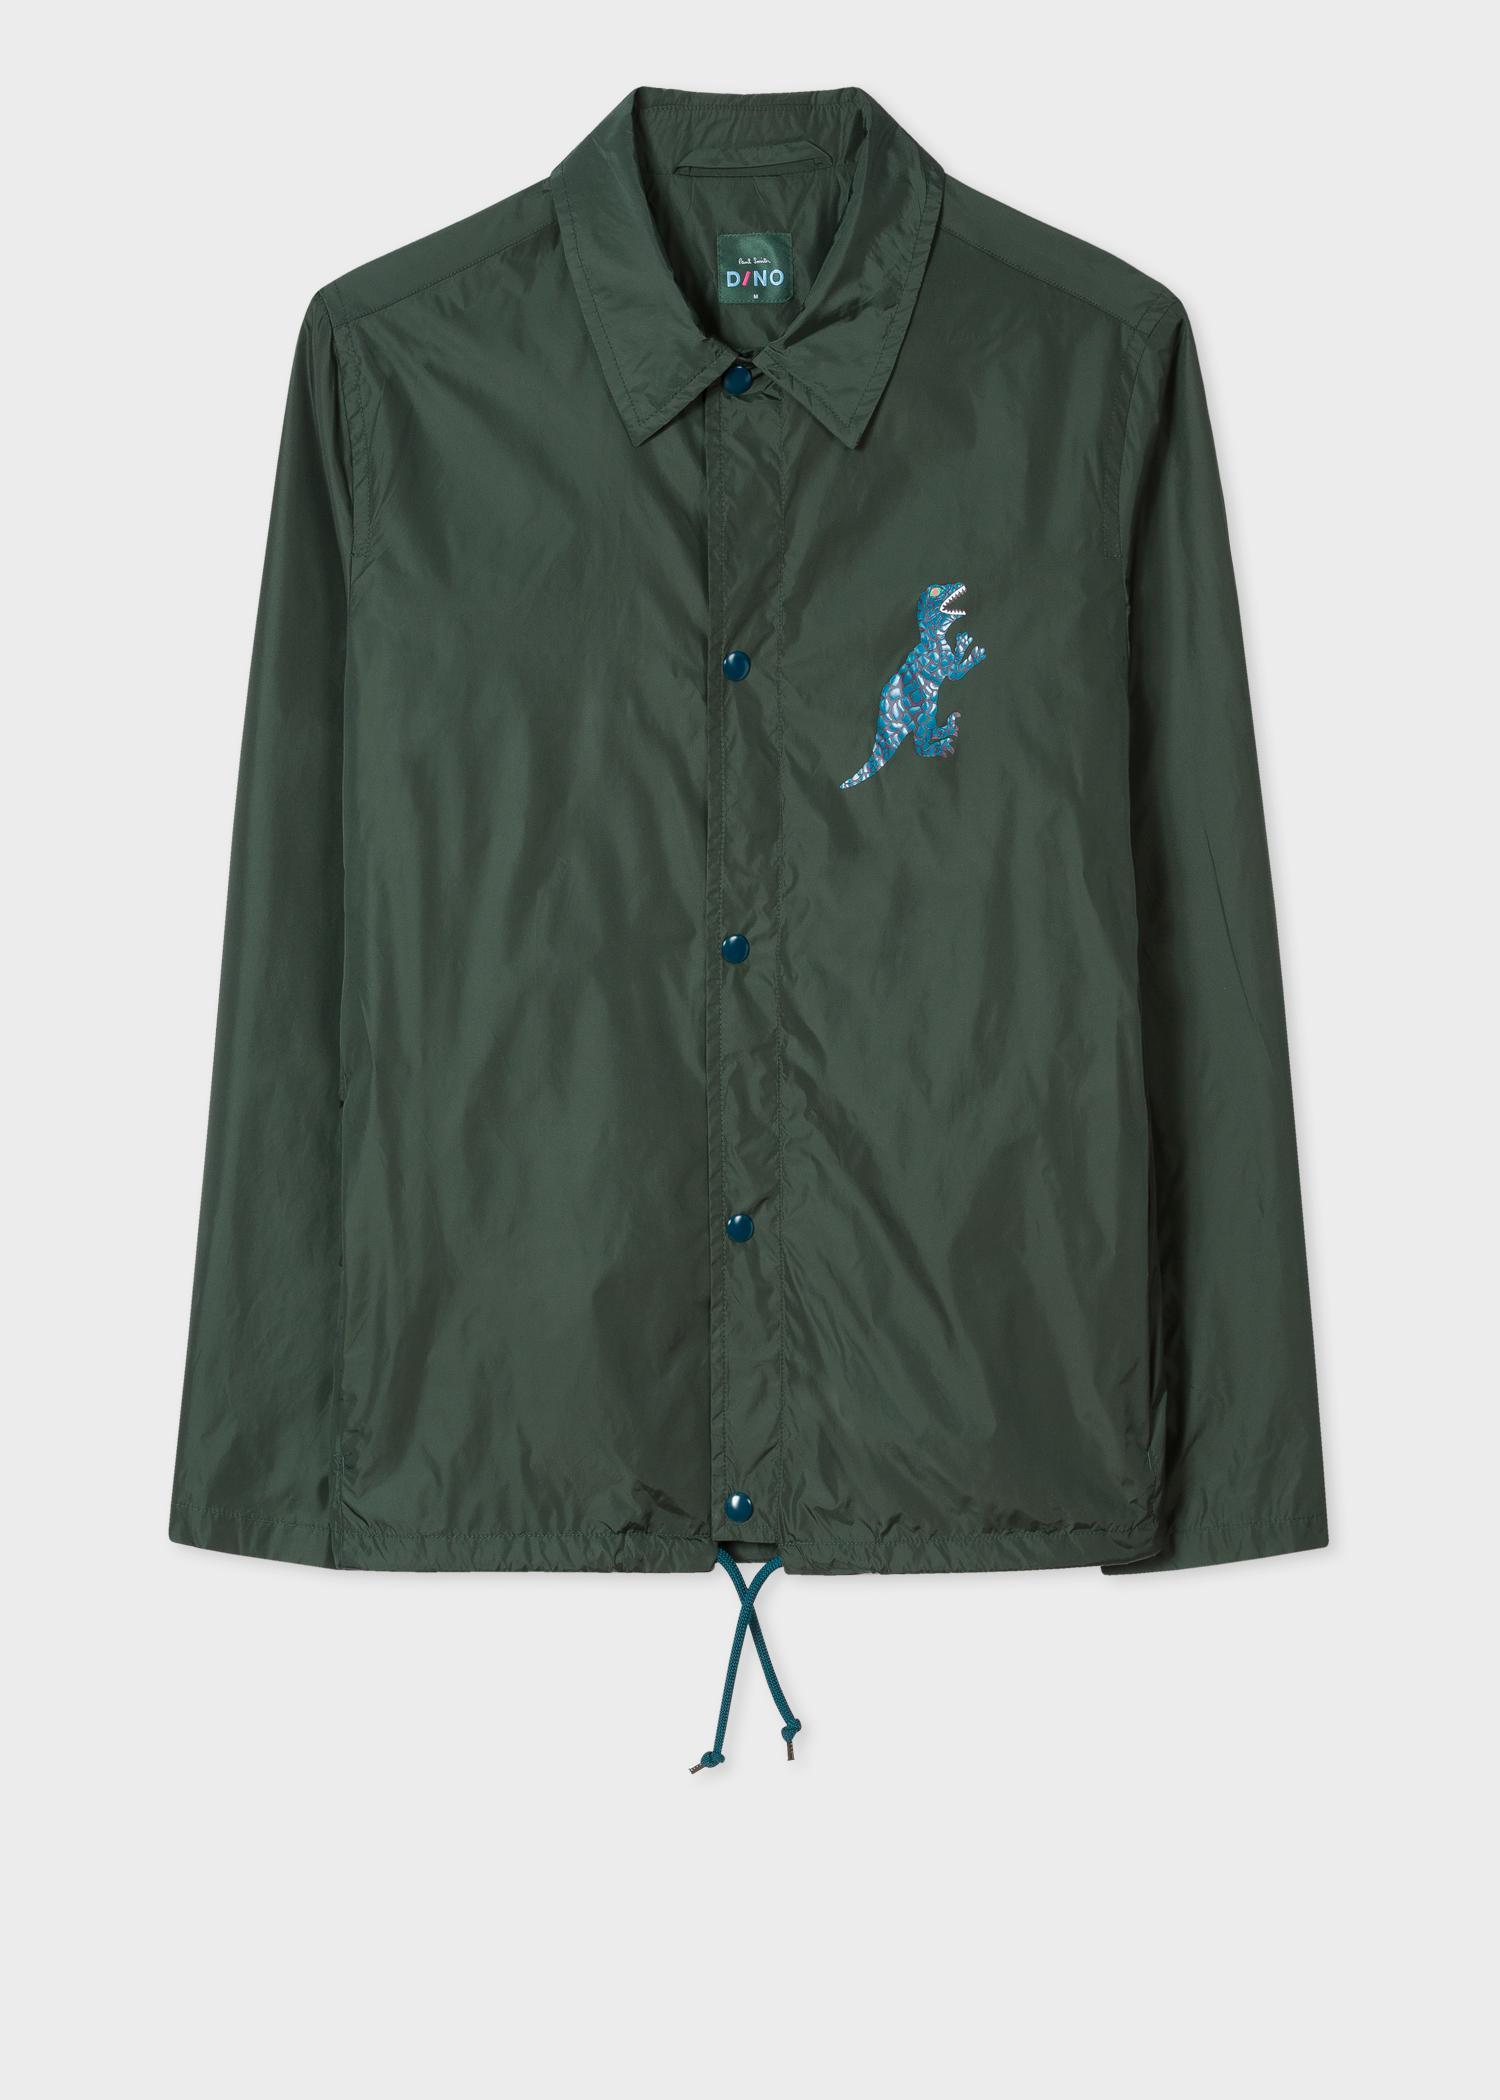 Paul Smith Synthetic Dark Green 'Dino' Print Coach Jacket for Men